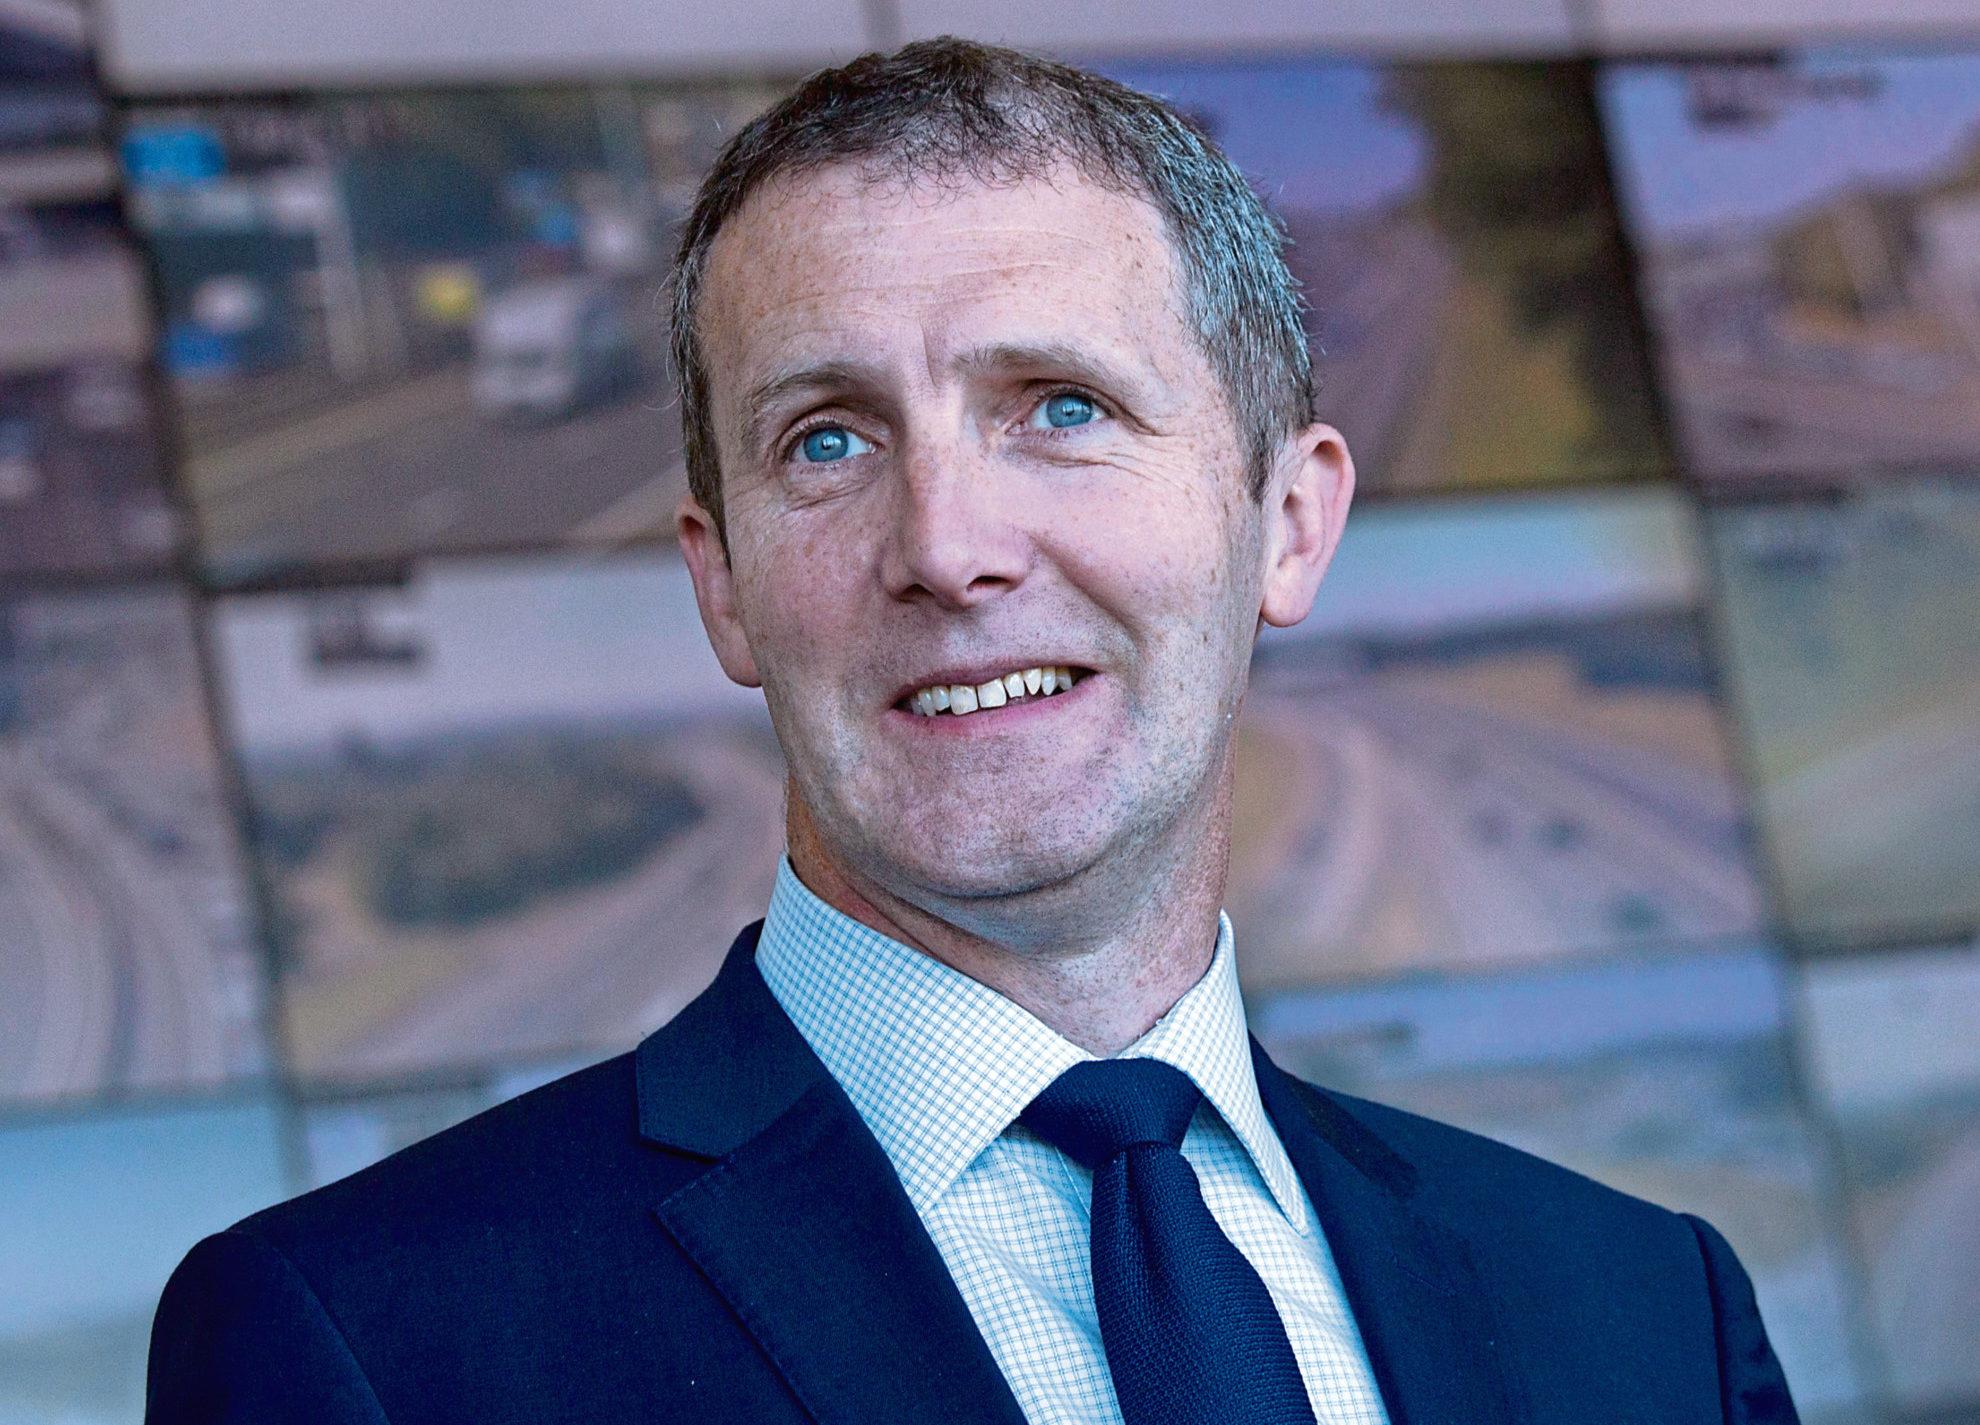 Transport Secretary Michael Matheson